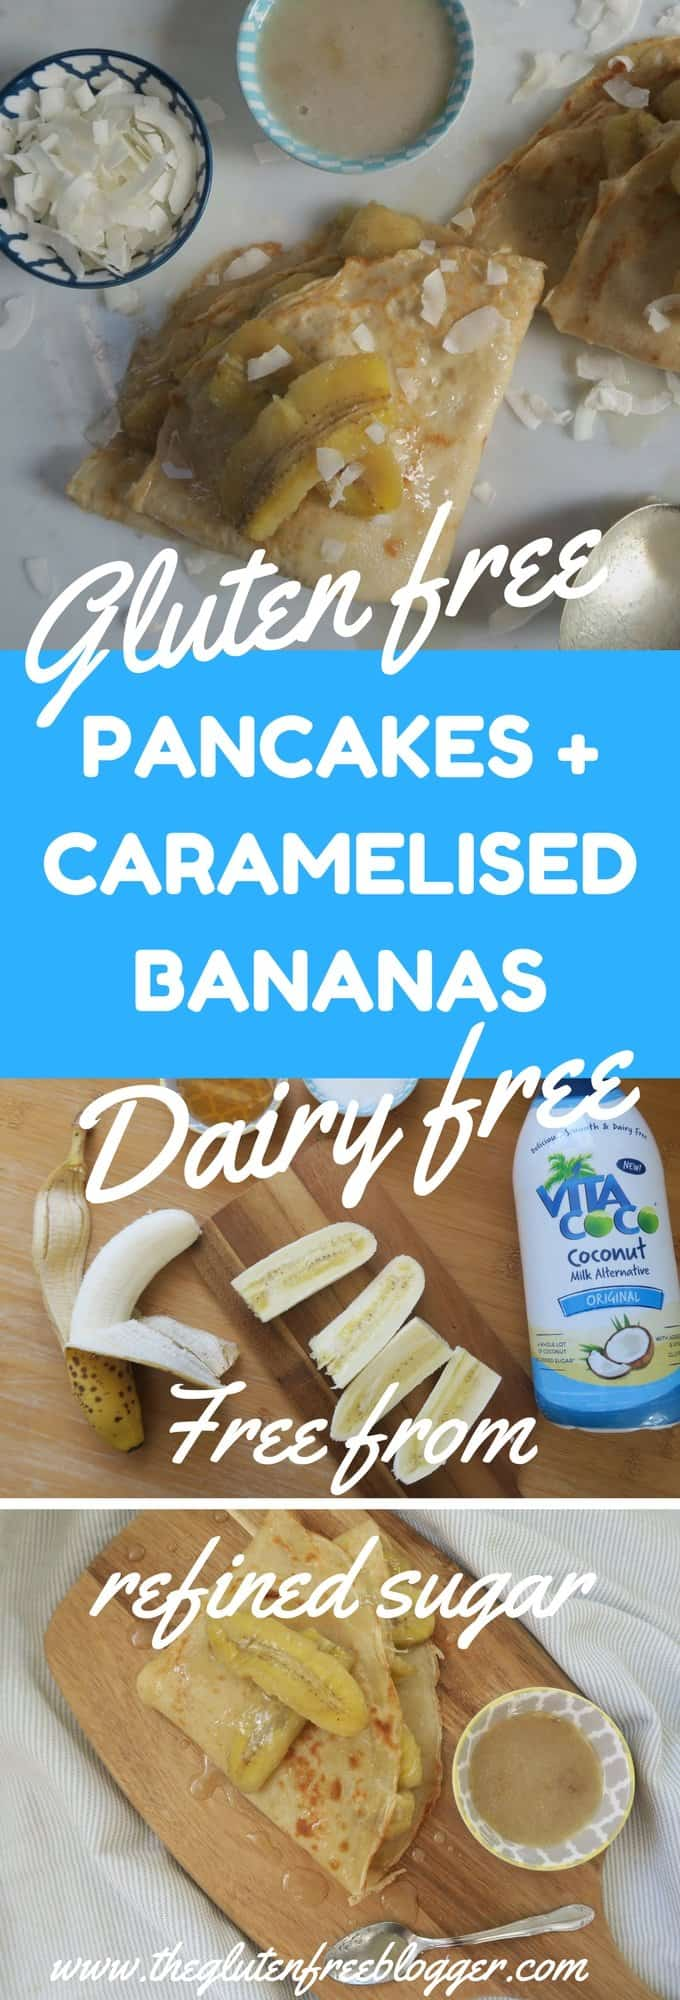 Gluten free, dairy free pancakes with caramelised bananas. With Vita Coco. - www.theglutenfreeblogger.com (1)